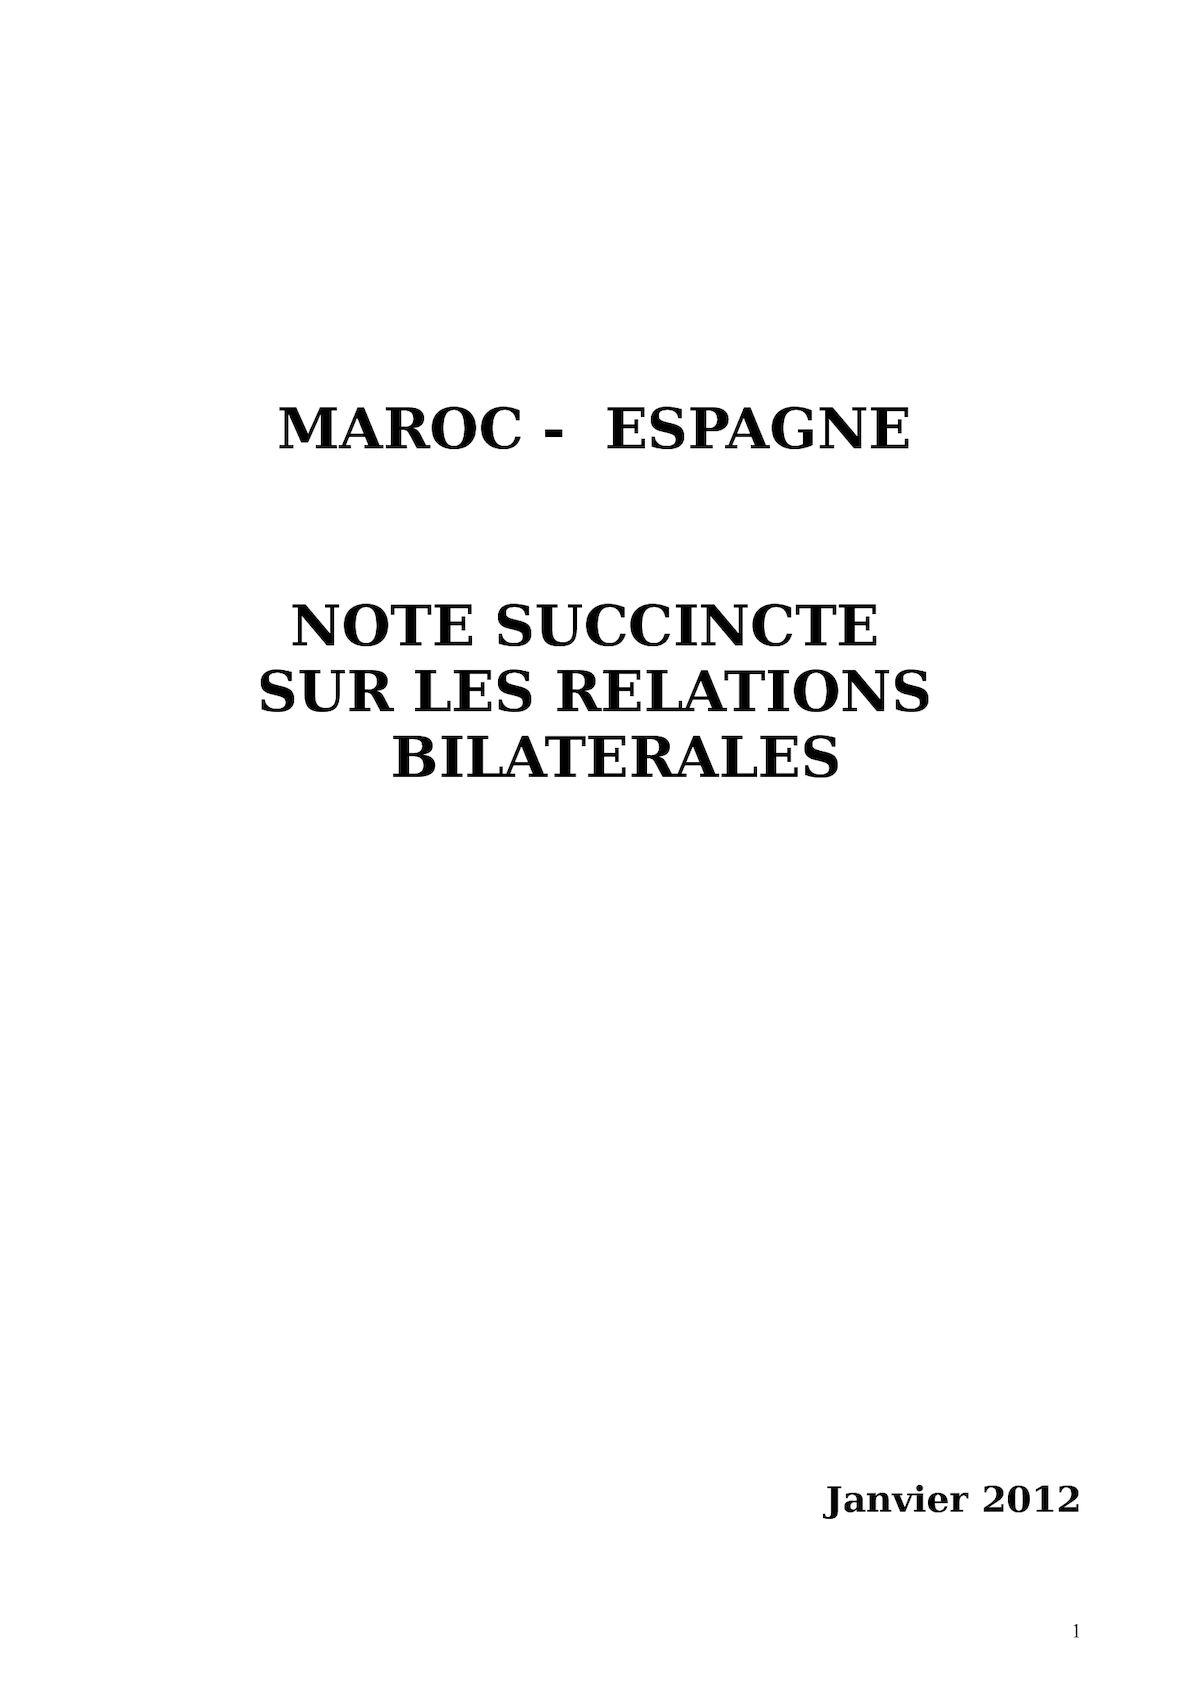 Note Succincte 2011